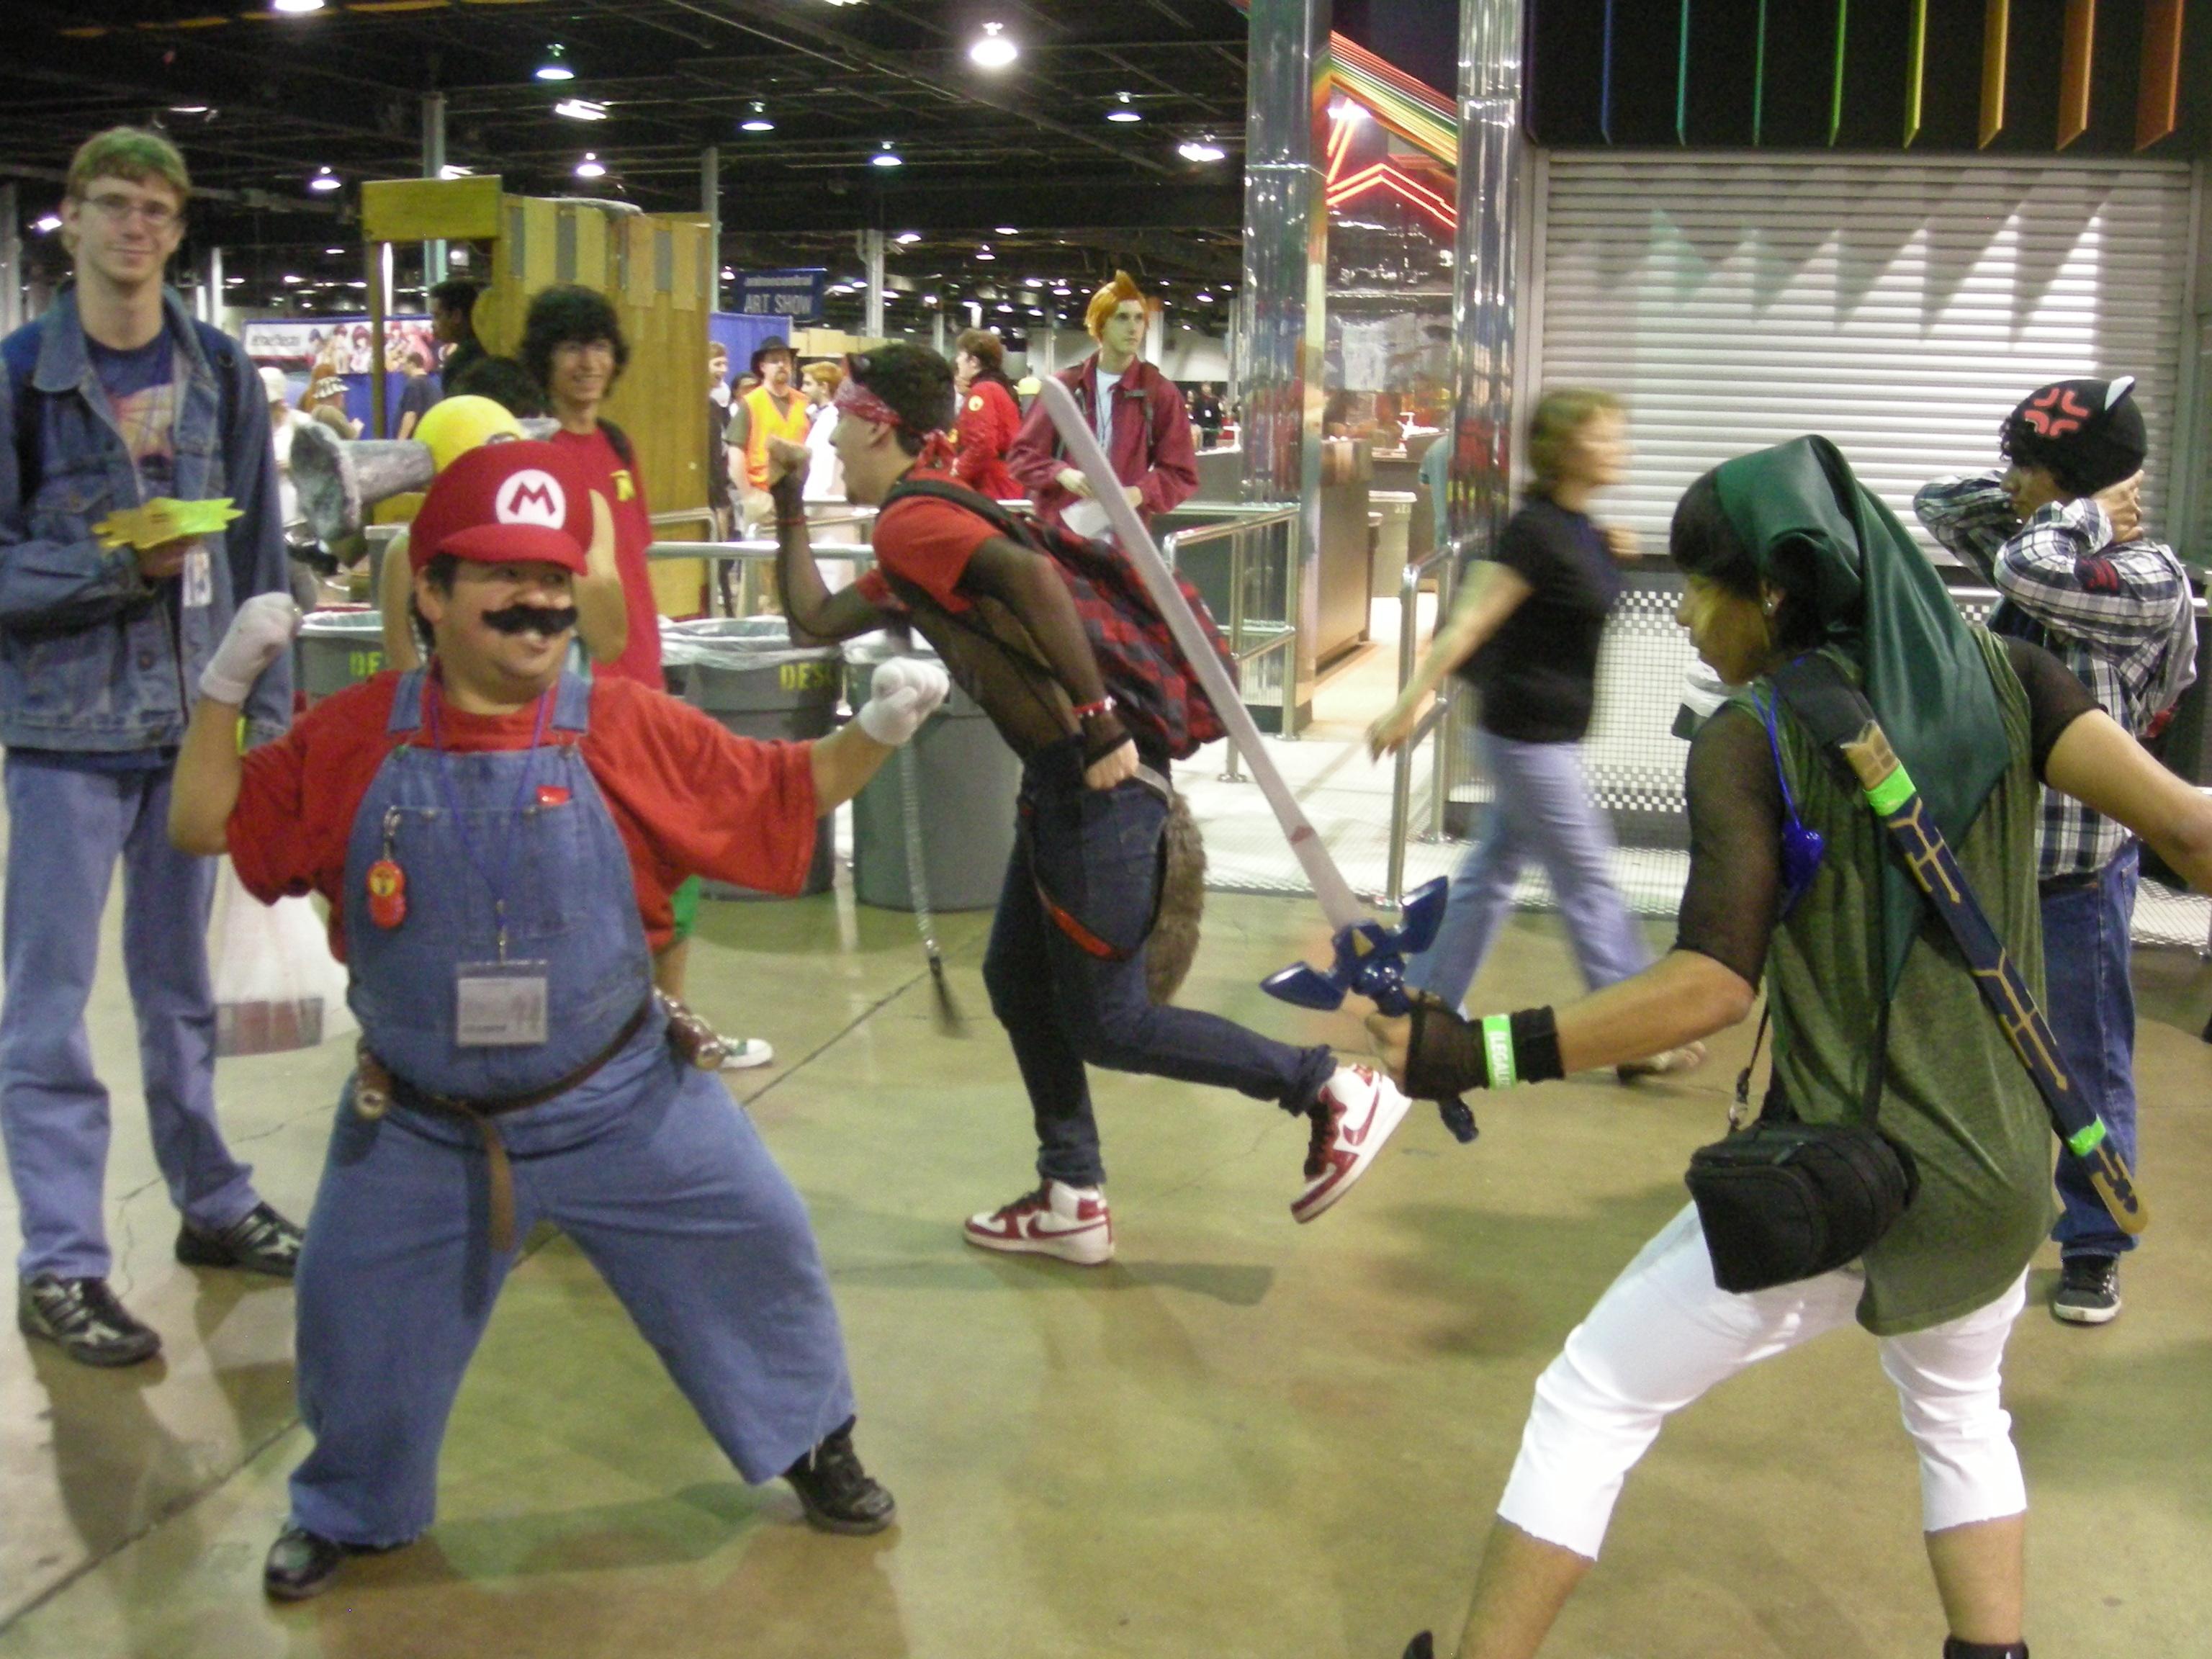 Mario vs Link Mock Battle